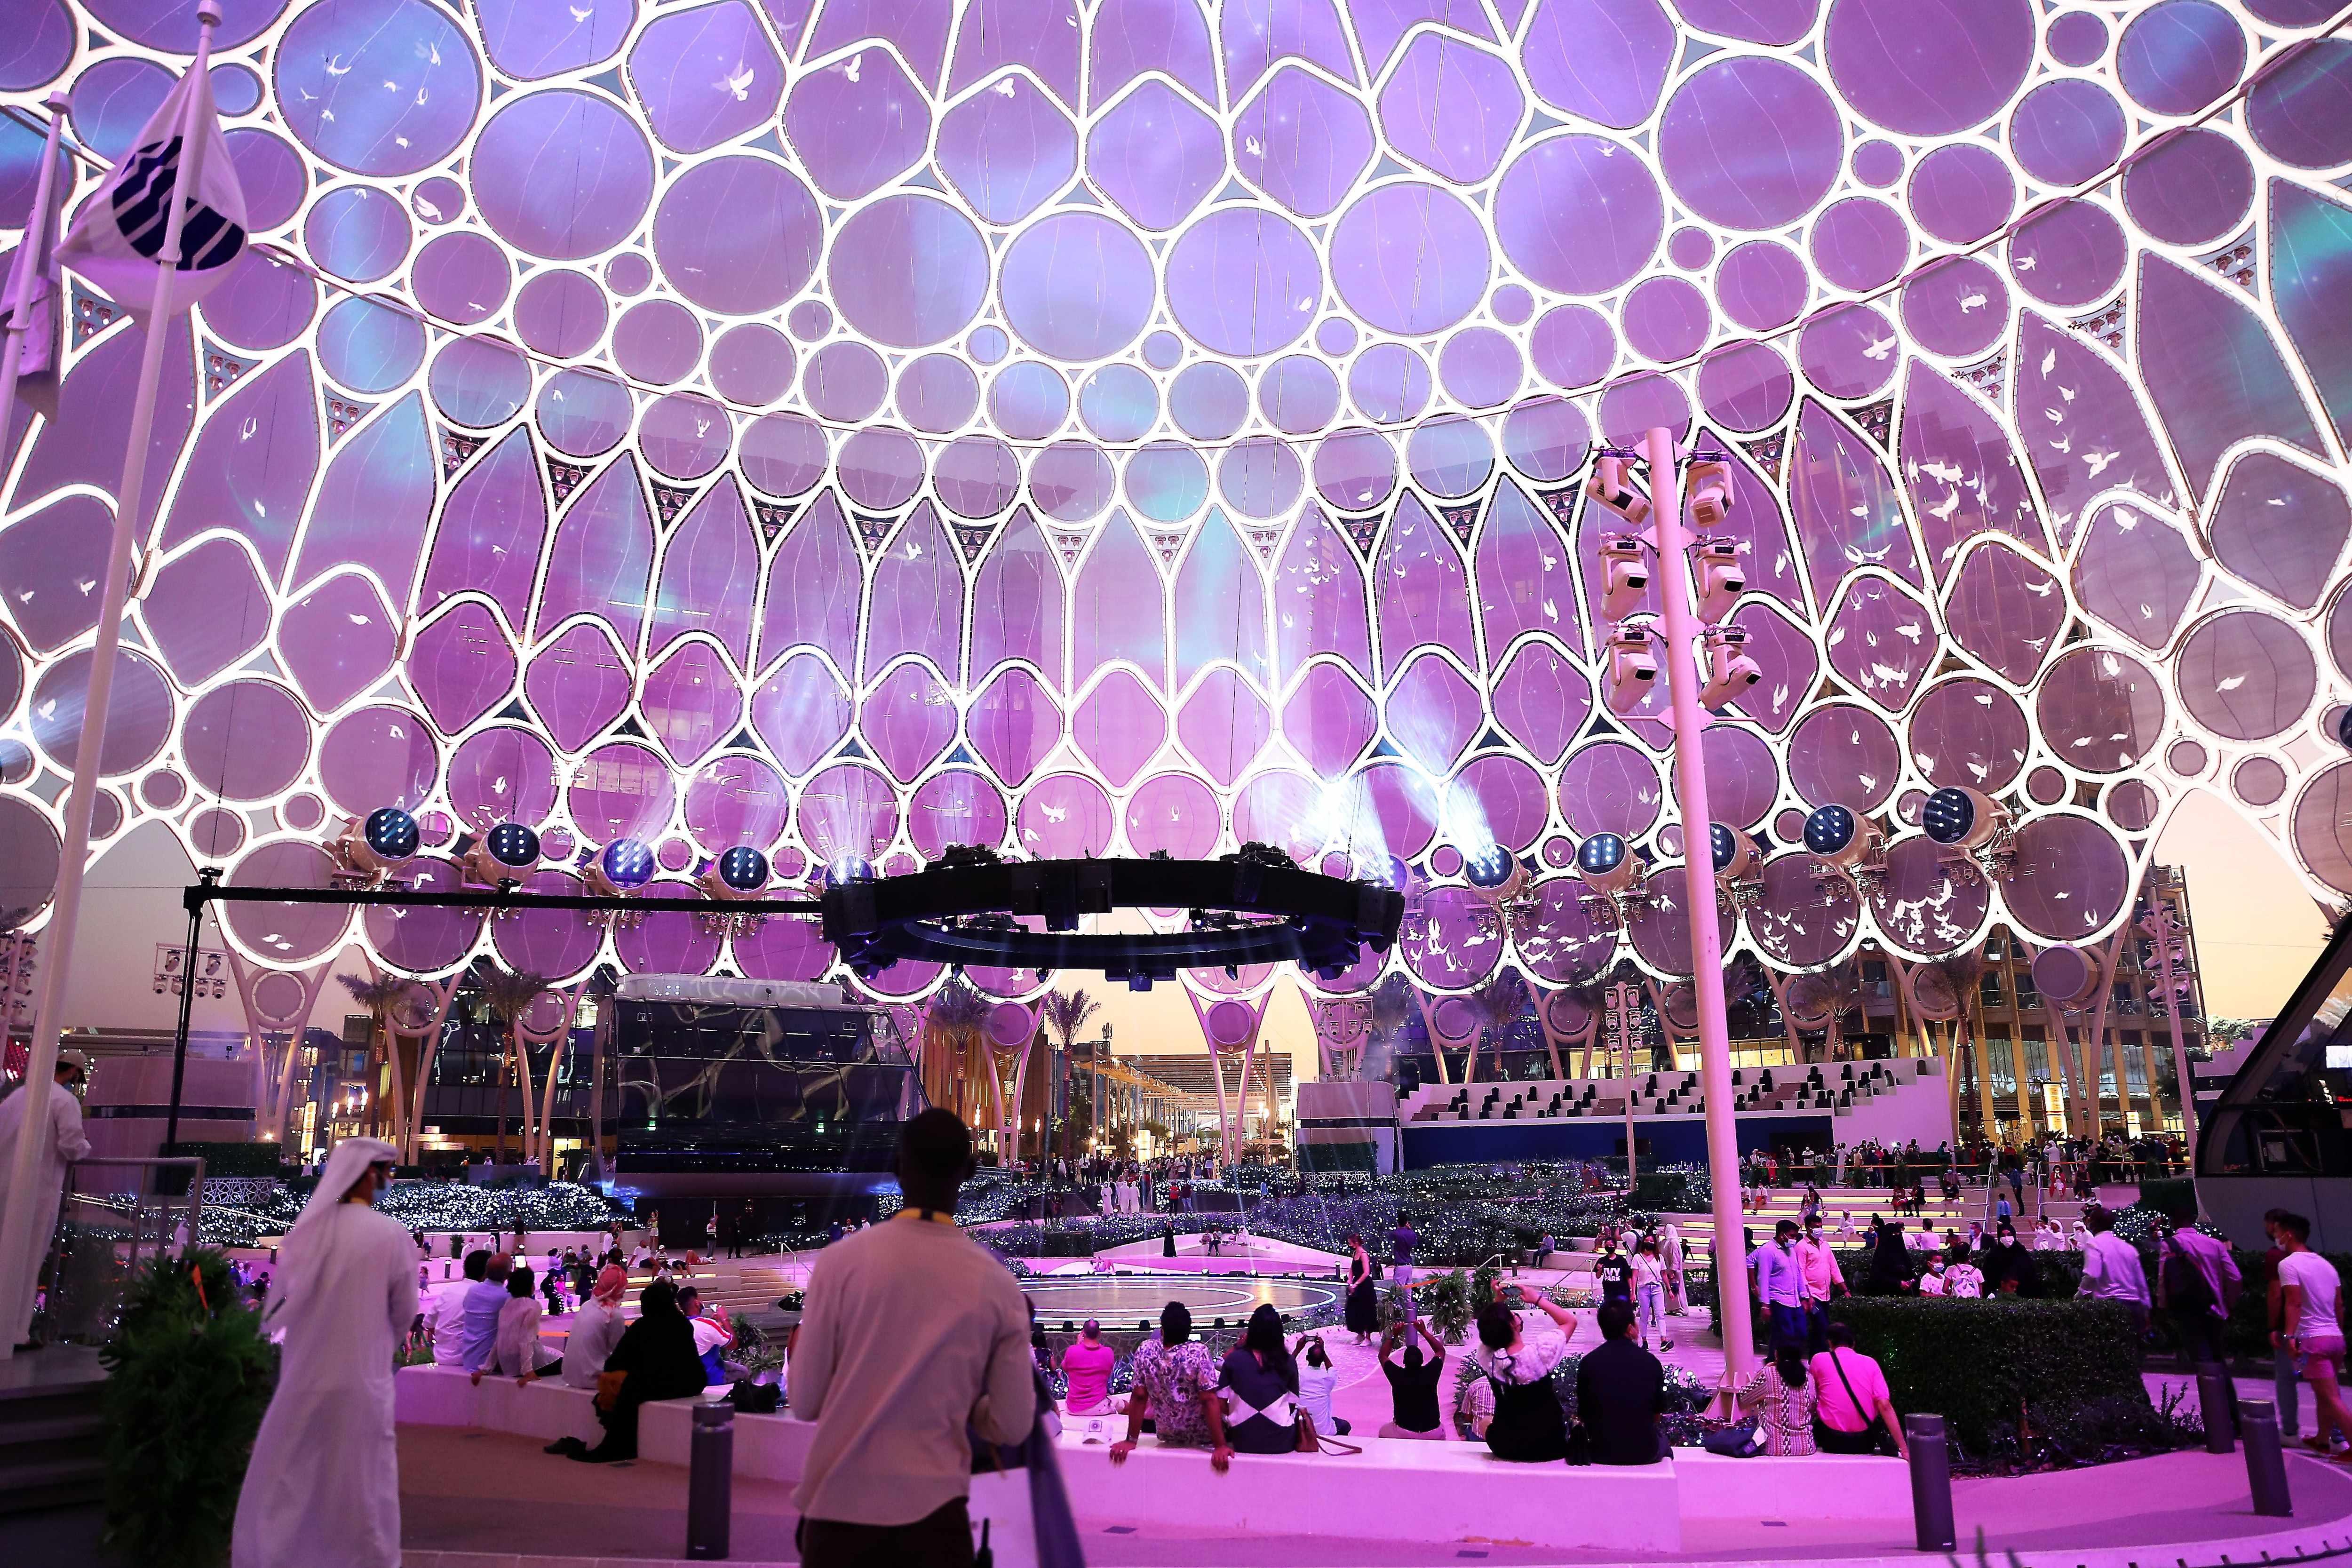 expo, light, show, worth, night,